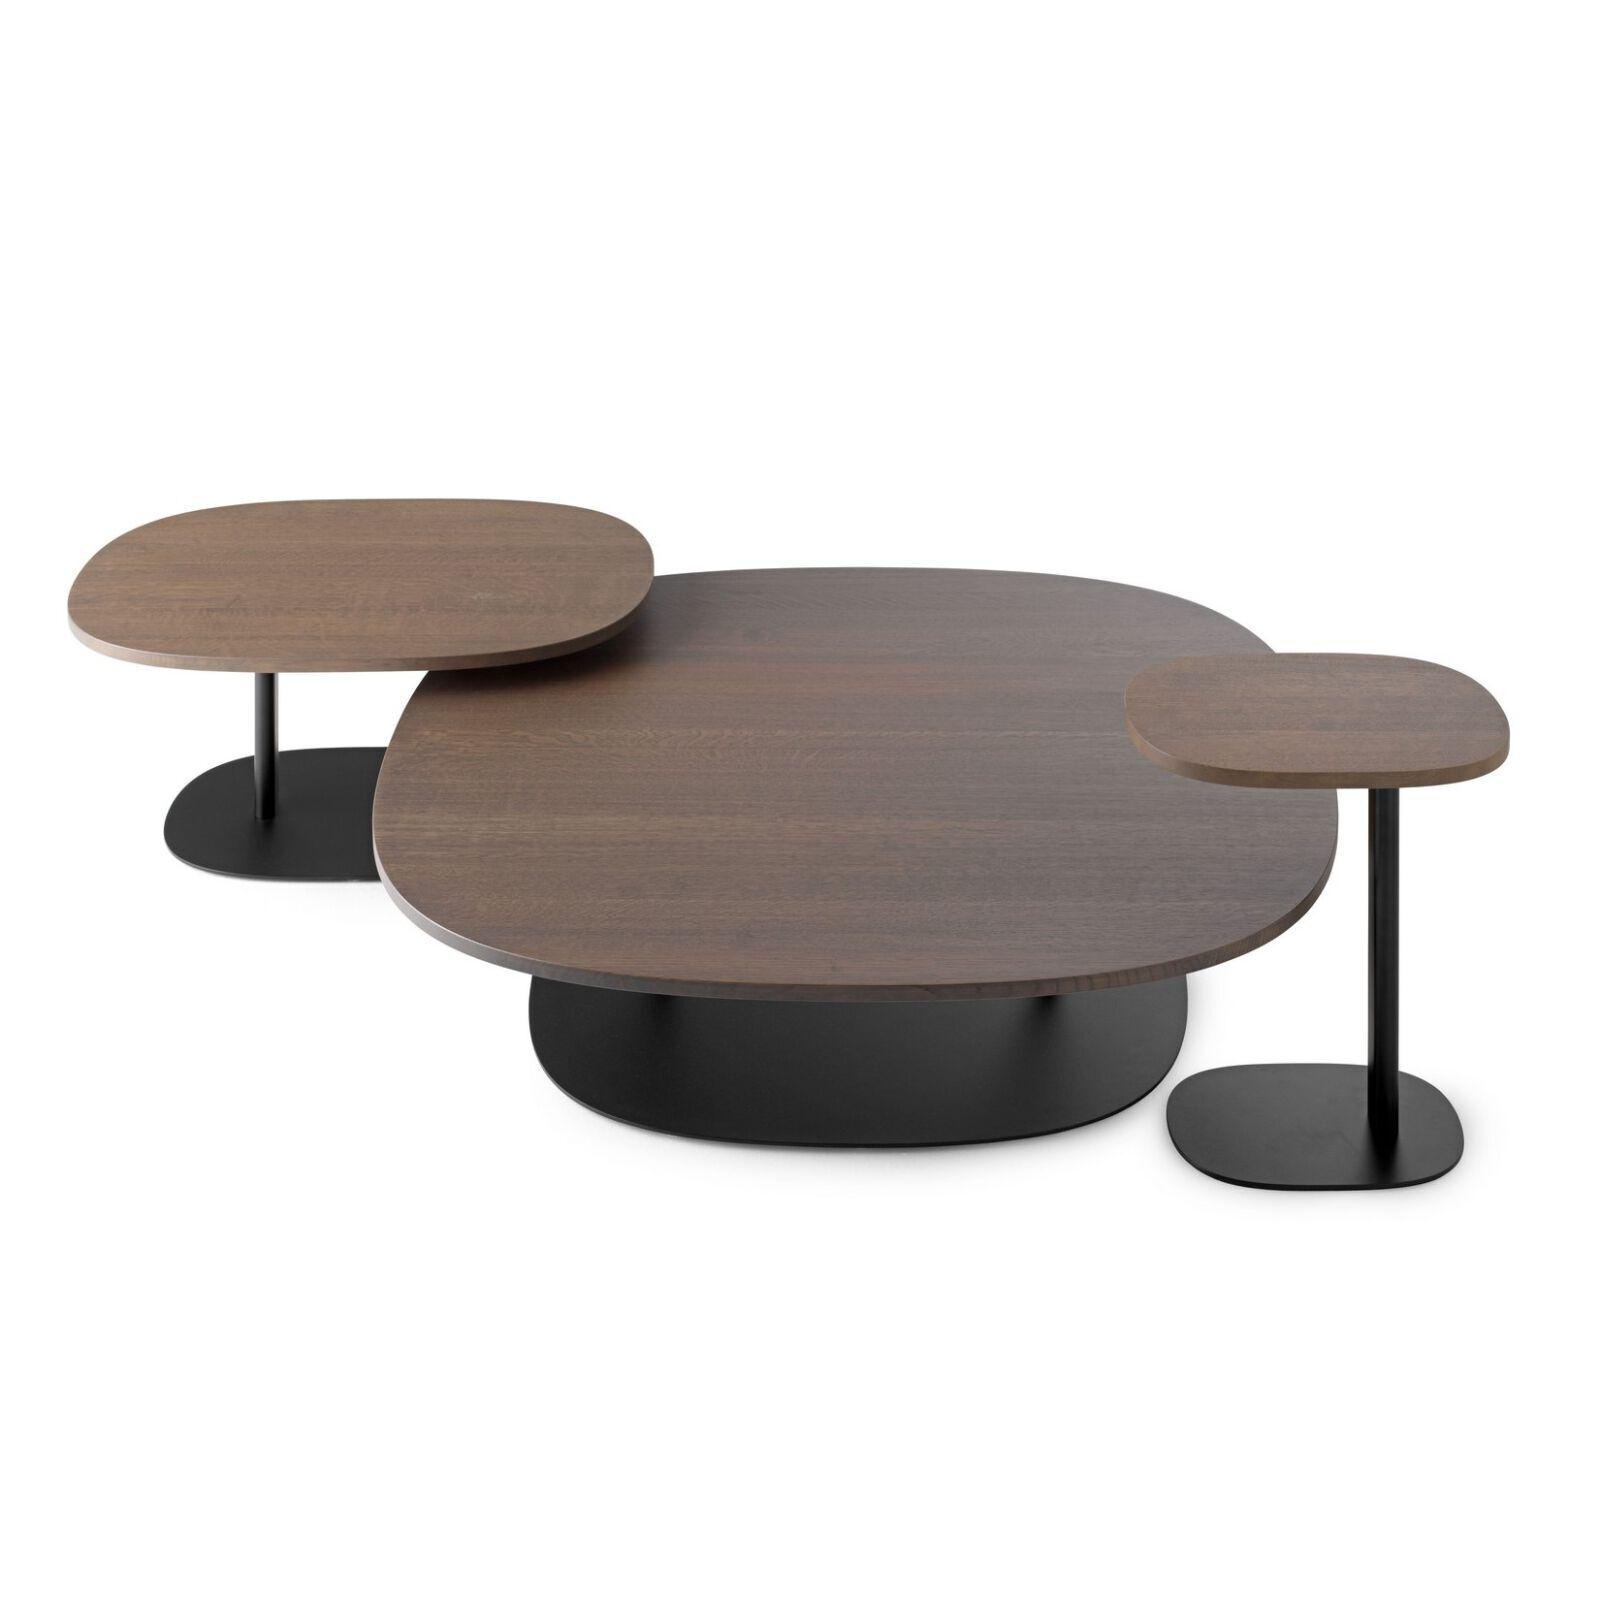 Leolux salontafel Toveri